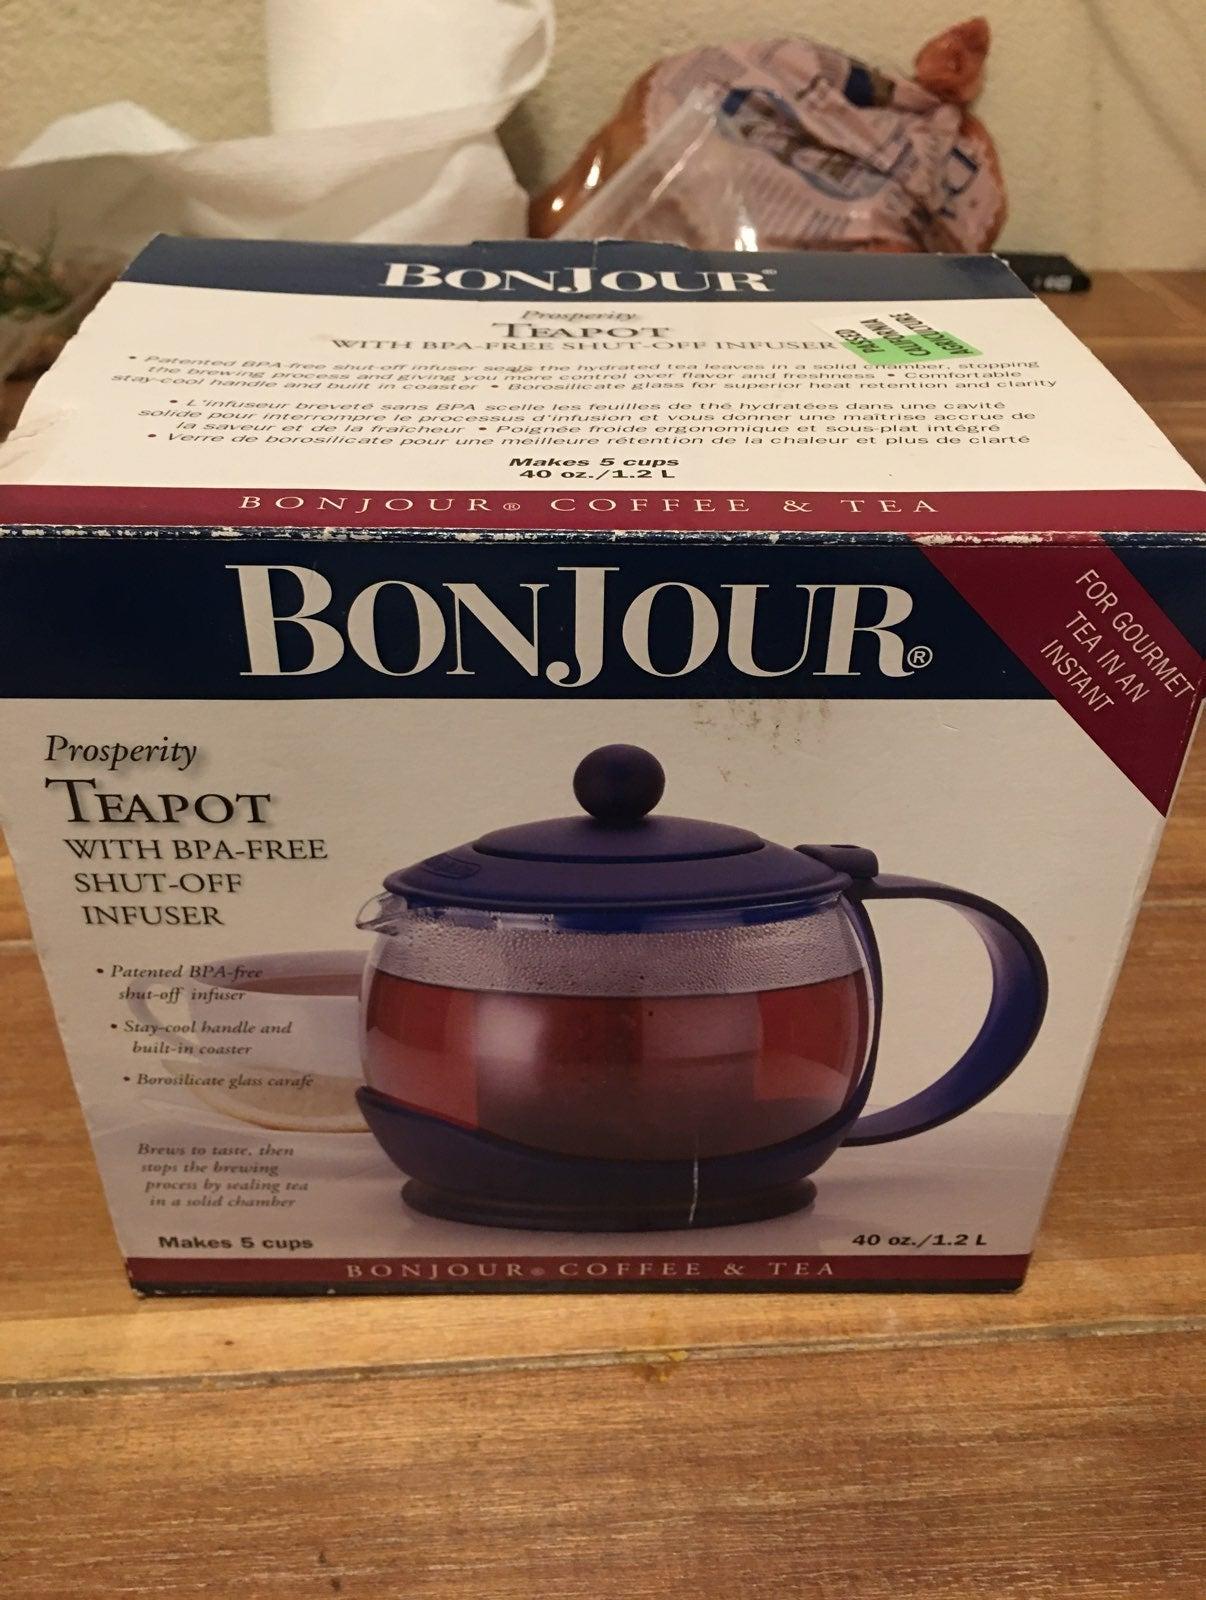 Bonjour Glass Teapot